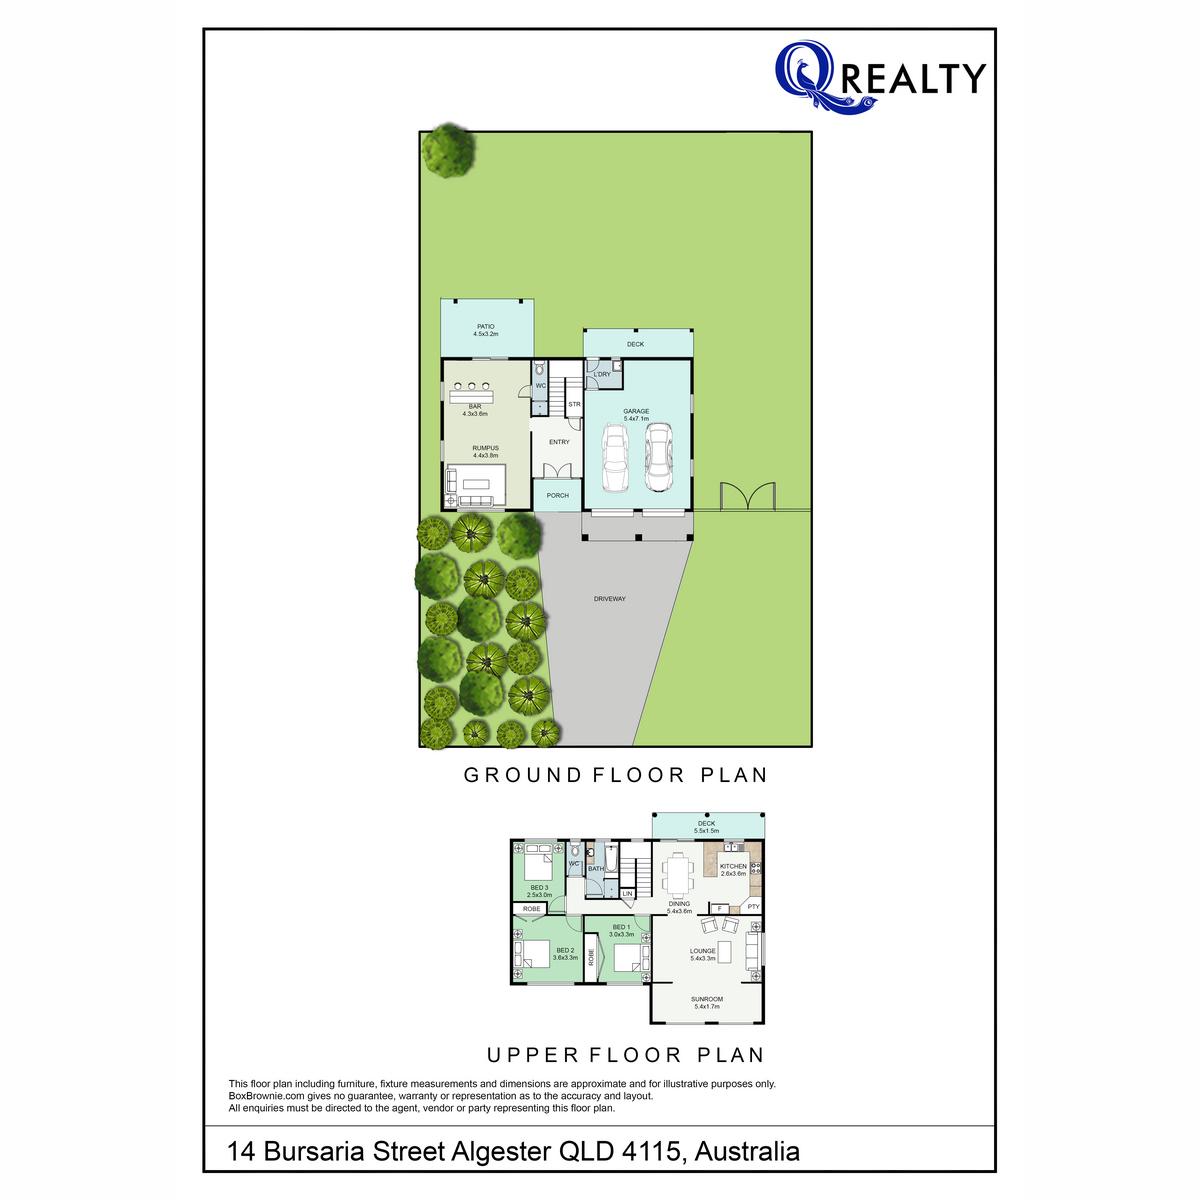 14 Bursaria Street, Algester  QLD  4115